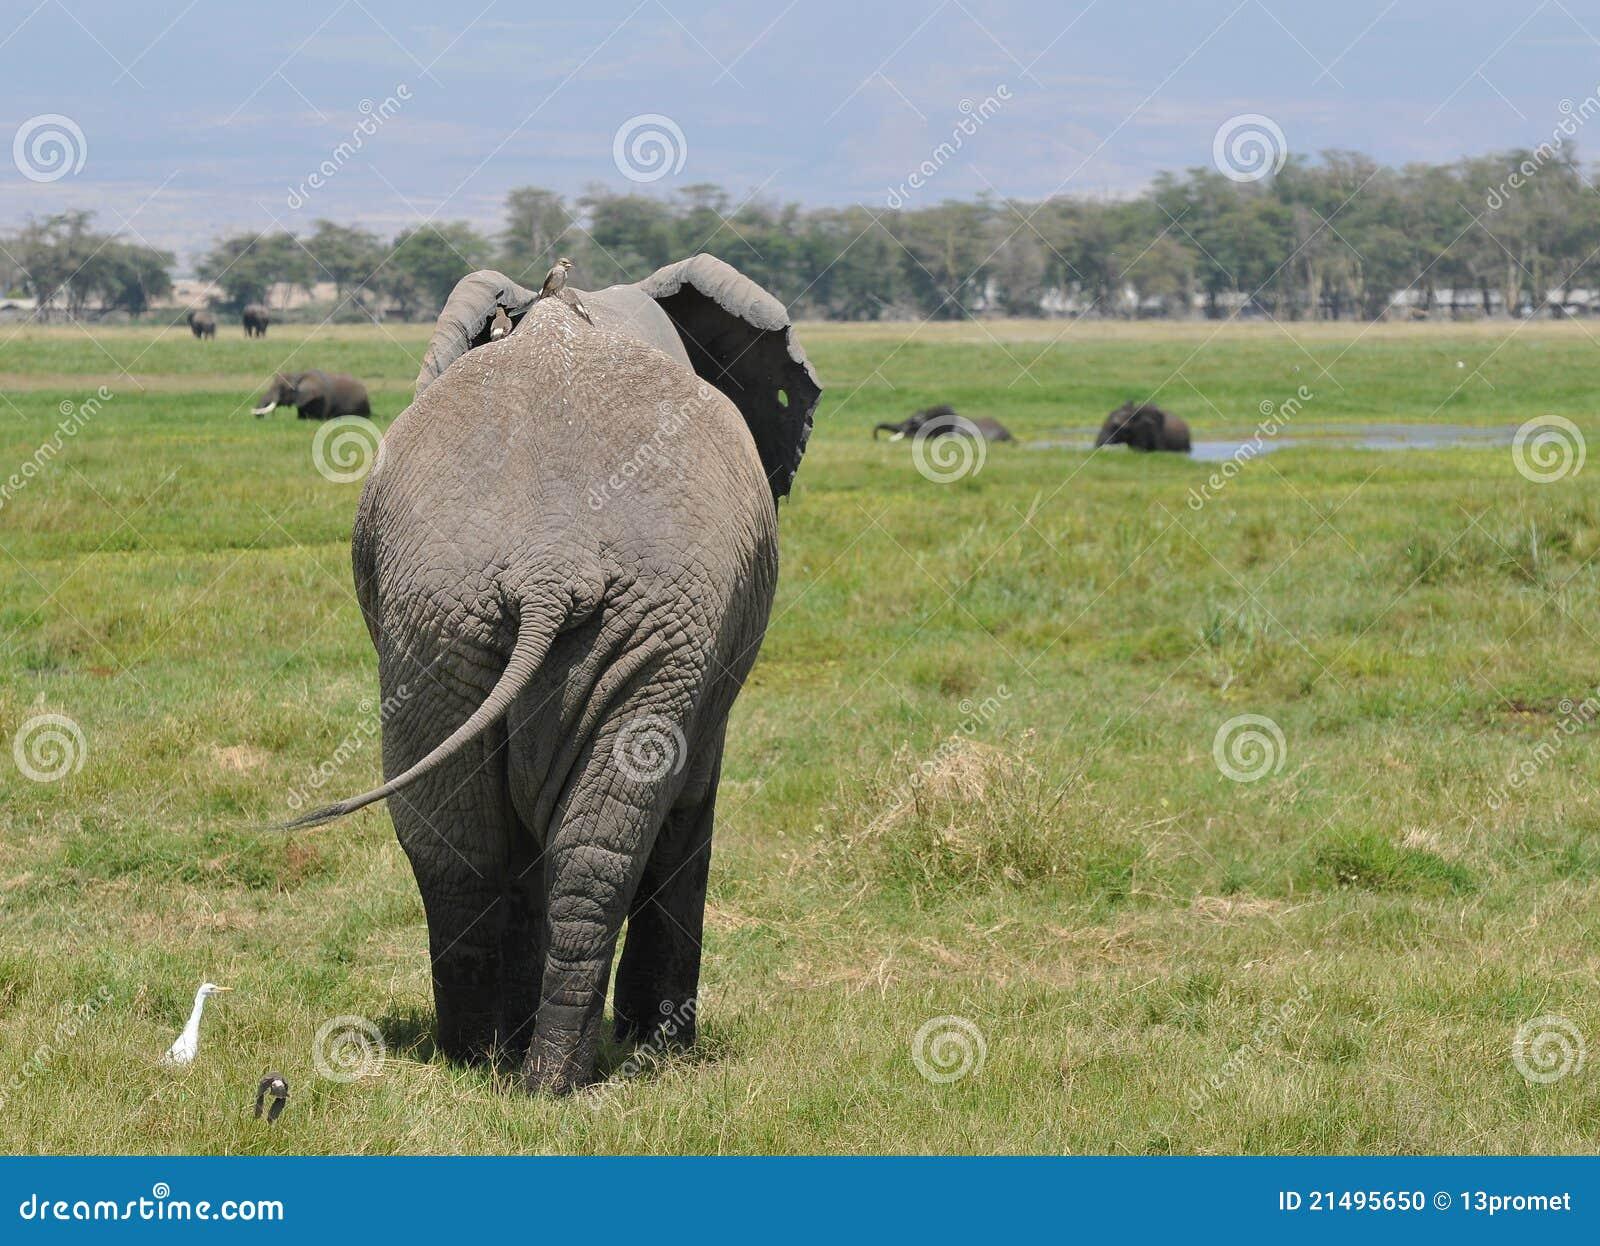 elephant back with birds